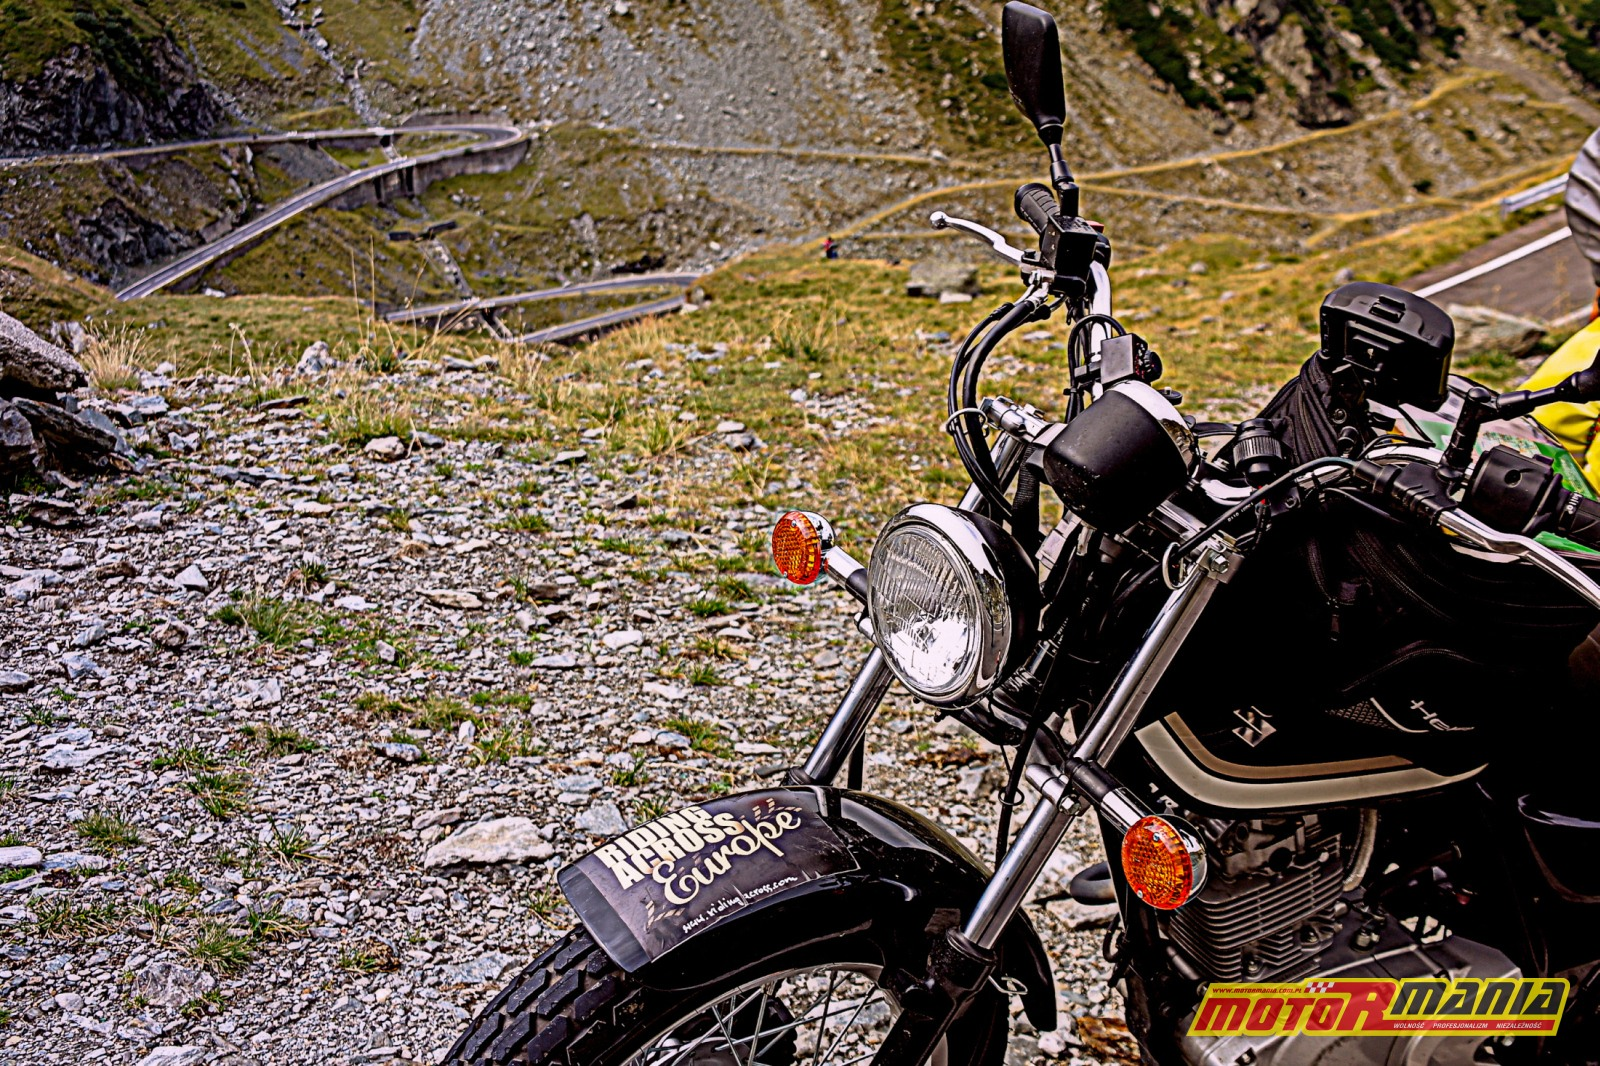 Riding Across Europe - Weronika Kwapisz (5)